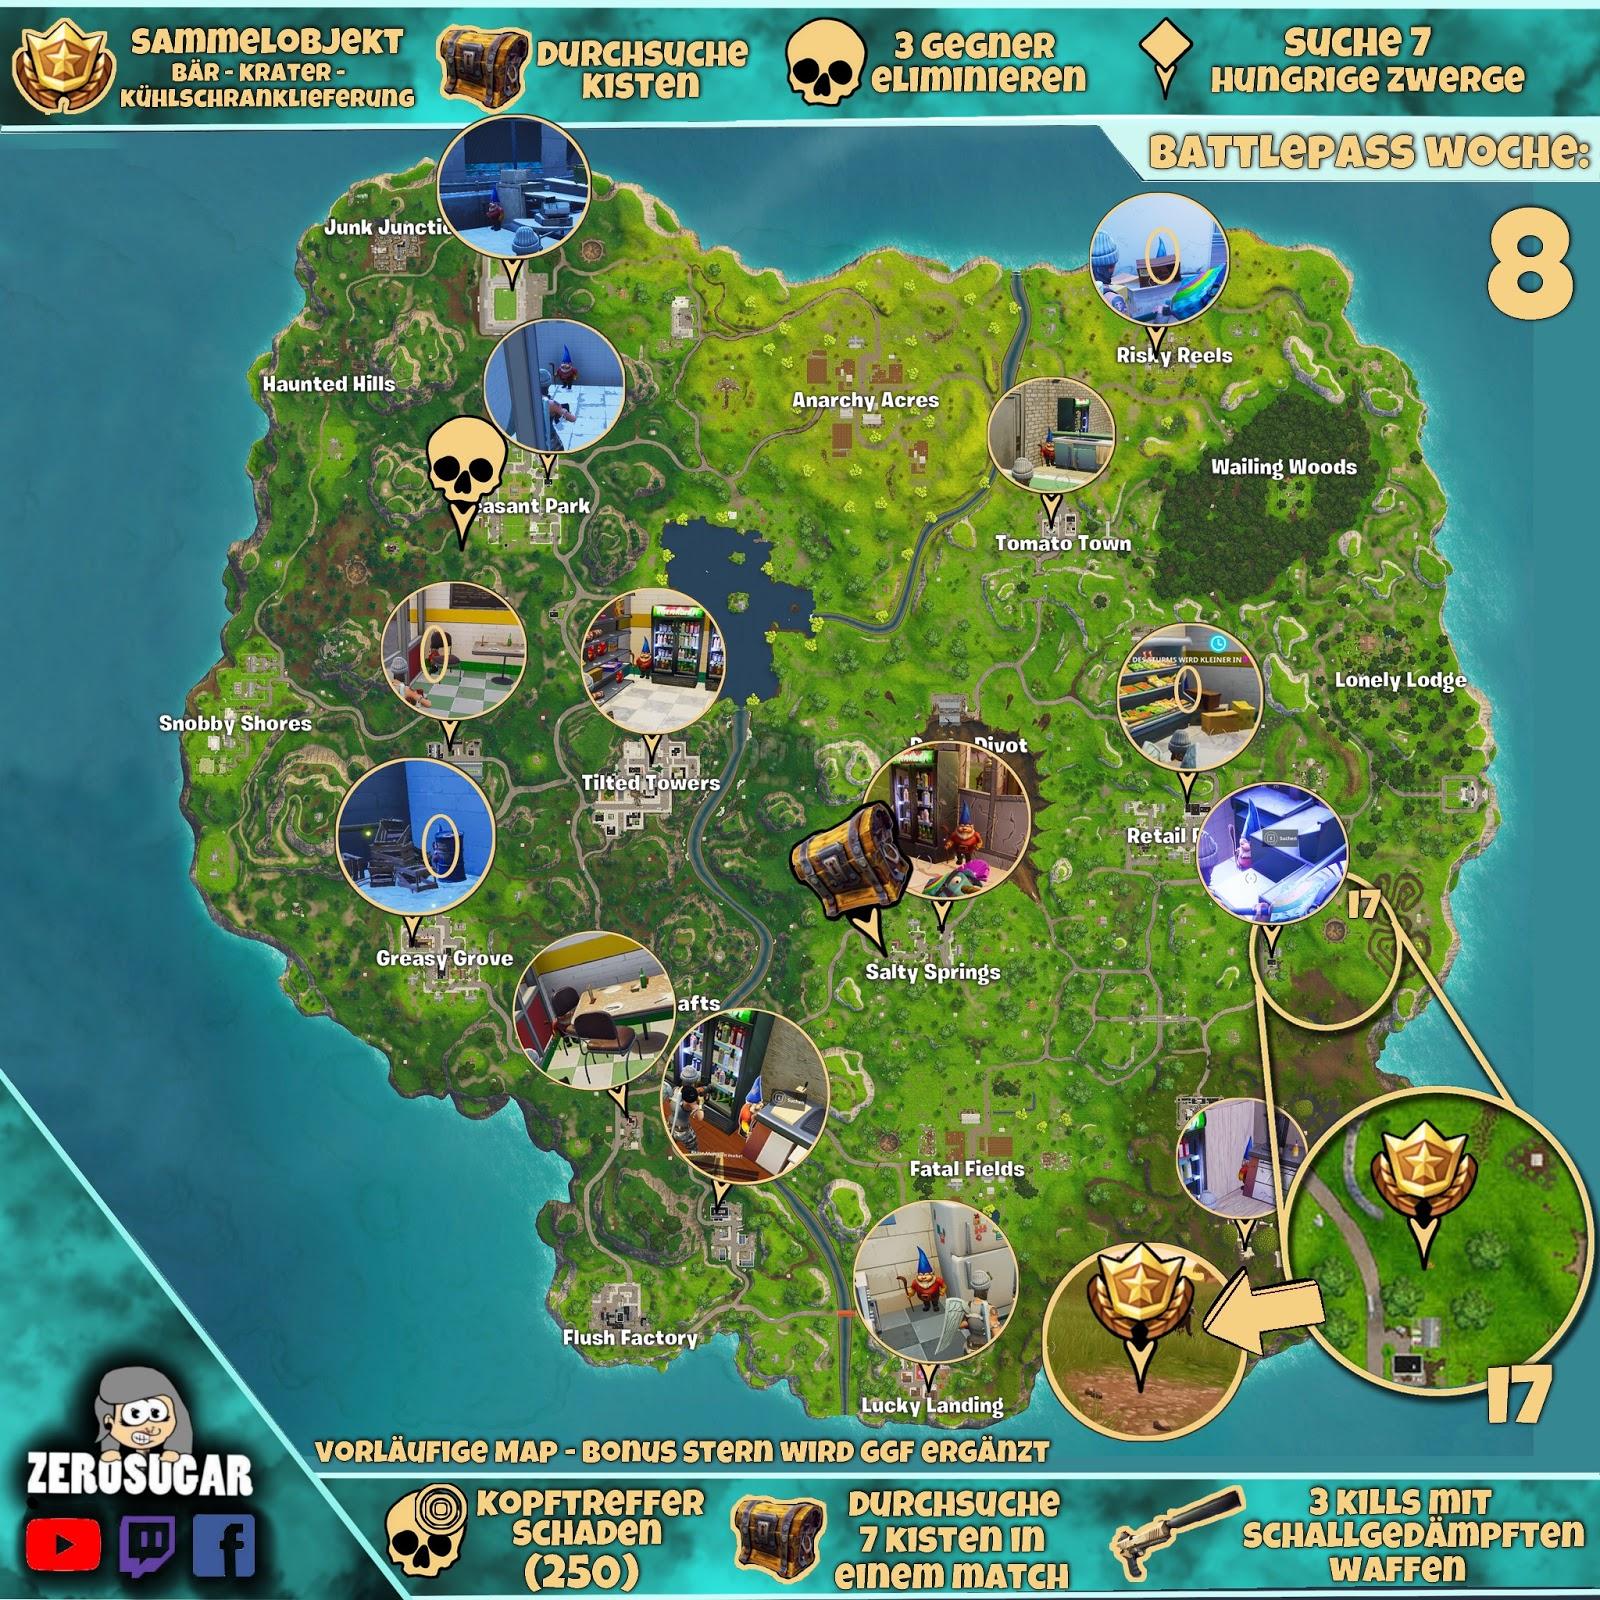 Woche 8 Losungen Battlepass Season 4 Fortnitetown Fortnite